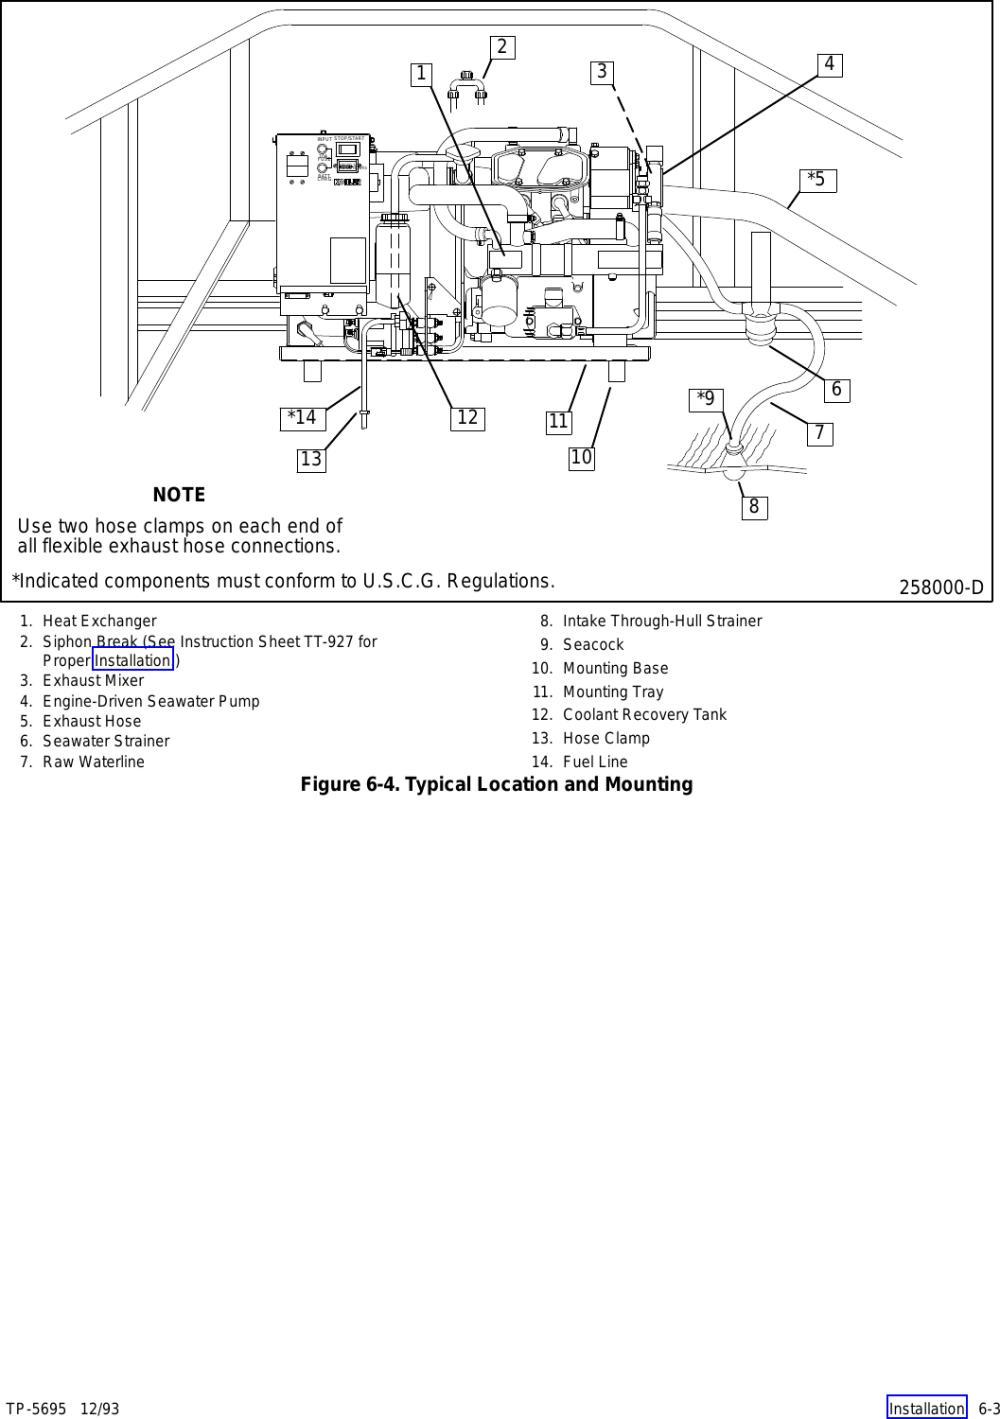 medium resolution of kohler 3 5cfz 4cz 6 5cz users manual operation manual 4 6 5cz 3 5 kohler engine 6 4 cz electrical diagram